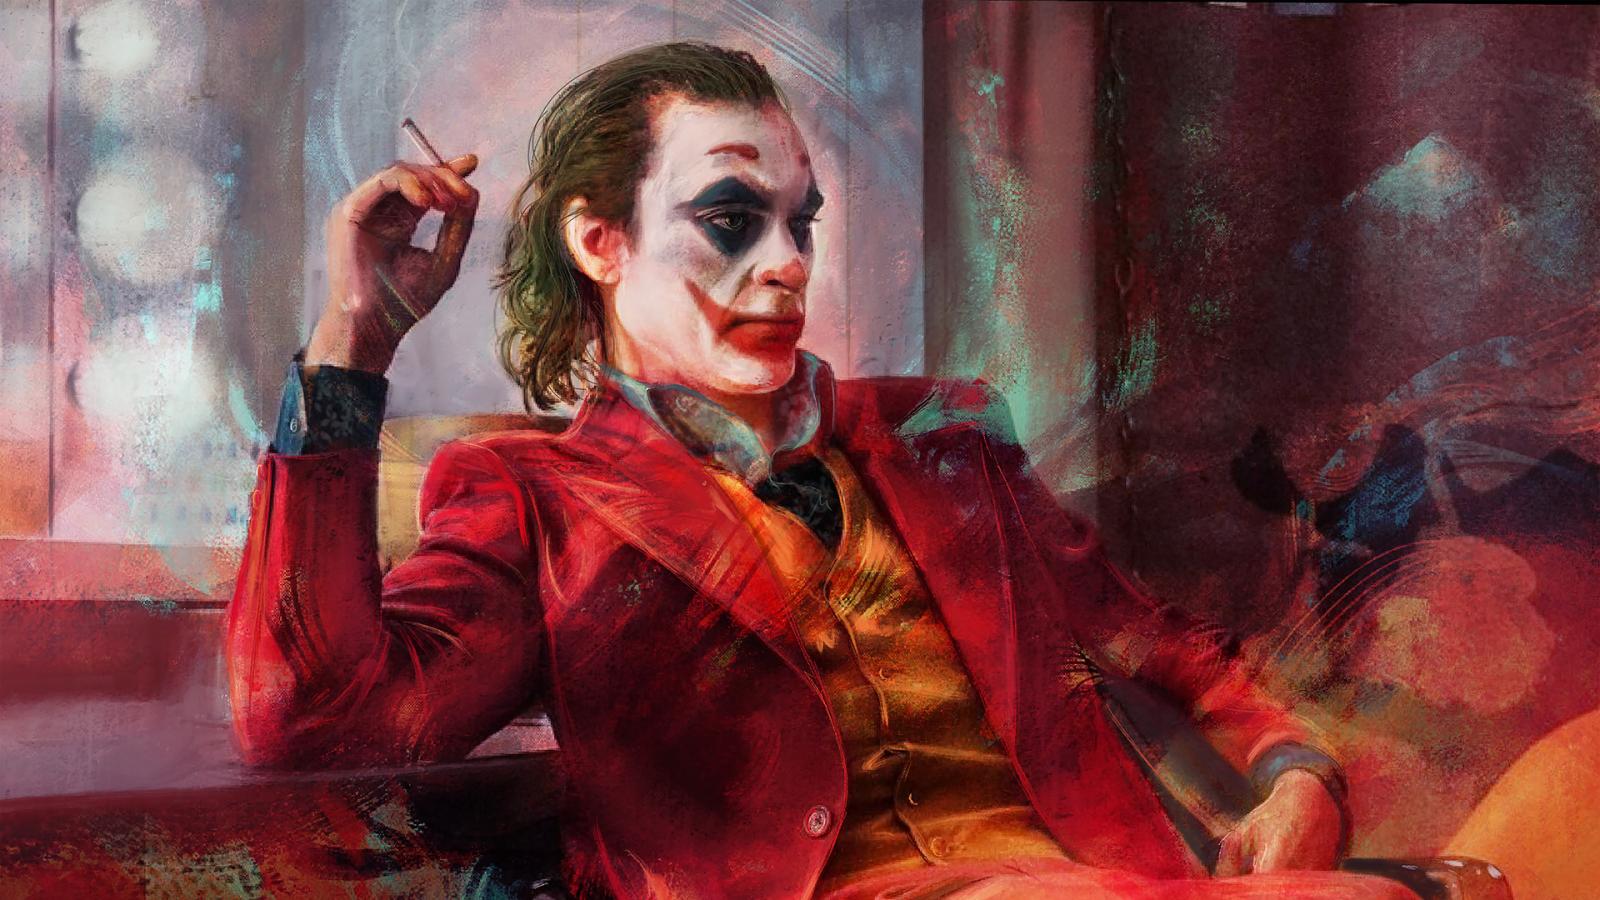 Wallpaper Joker 2019 Movie Joaquin Phoenix Dc Comics